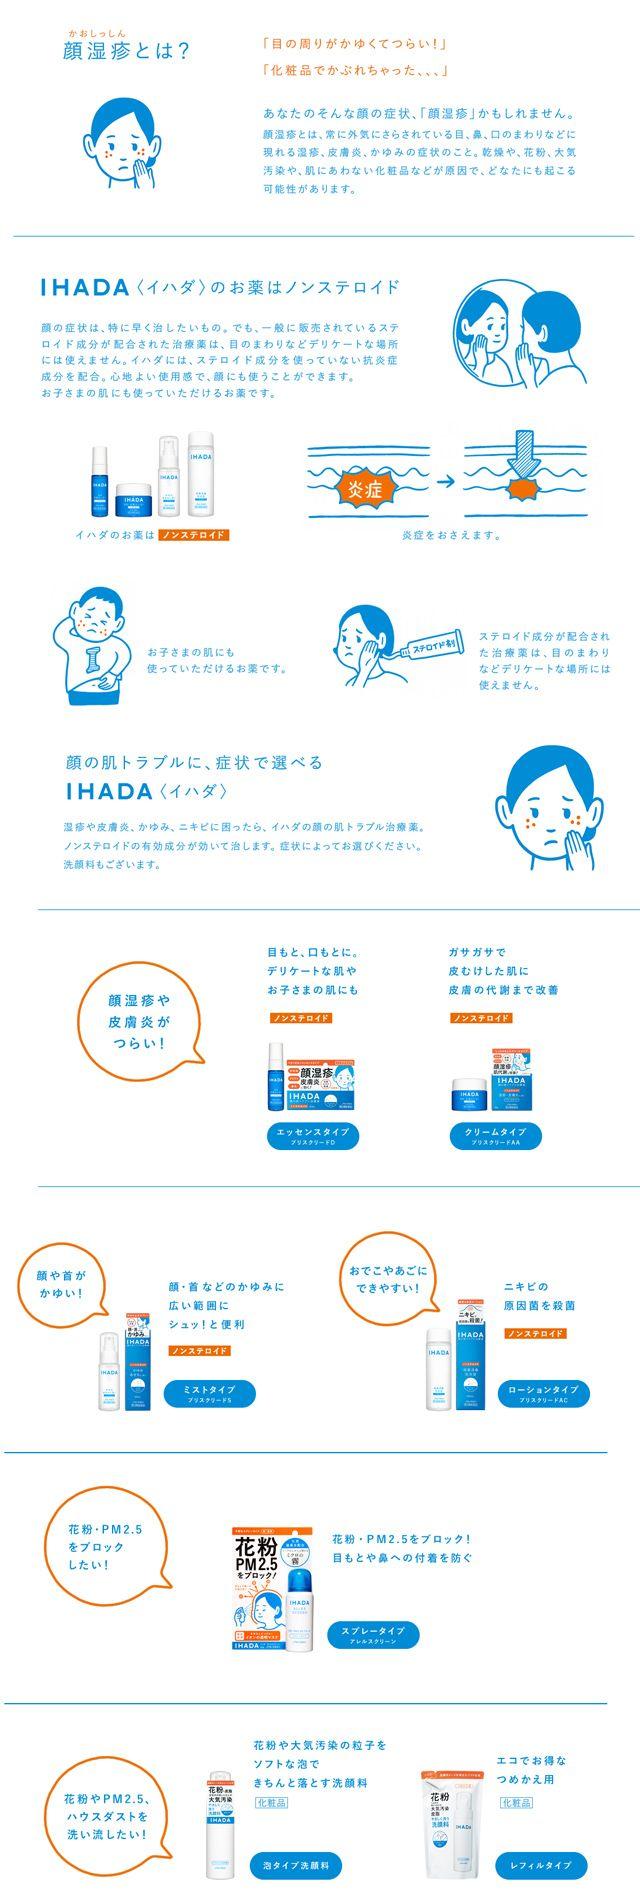 Noritake 資生堂のノンステロイドの顔のハダトラブル治療薬「IHADA」 資生堂IHADA